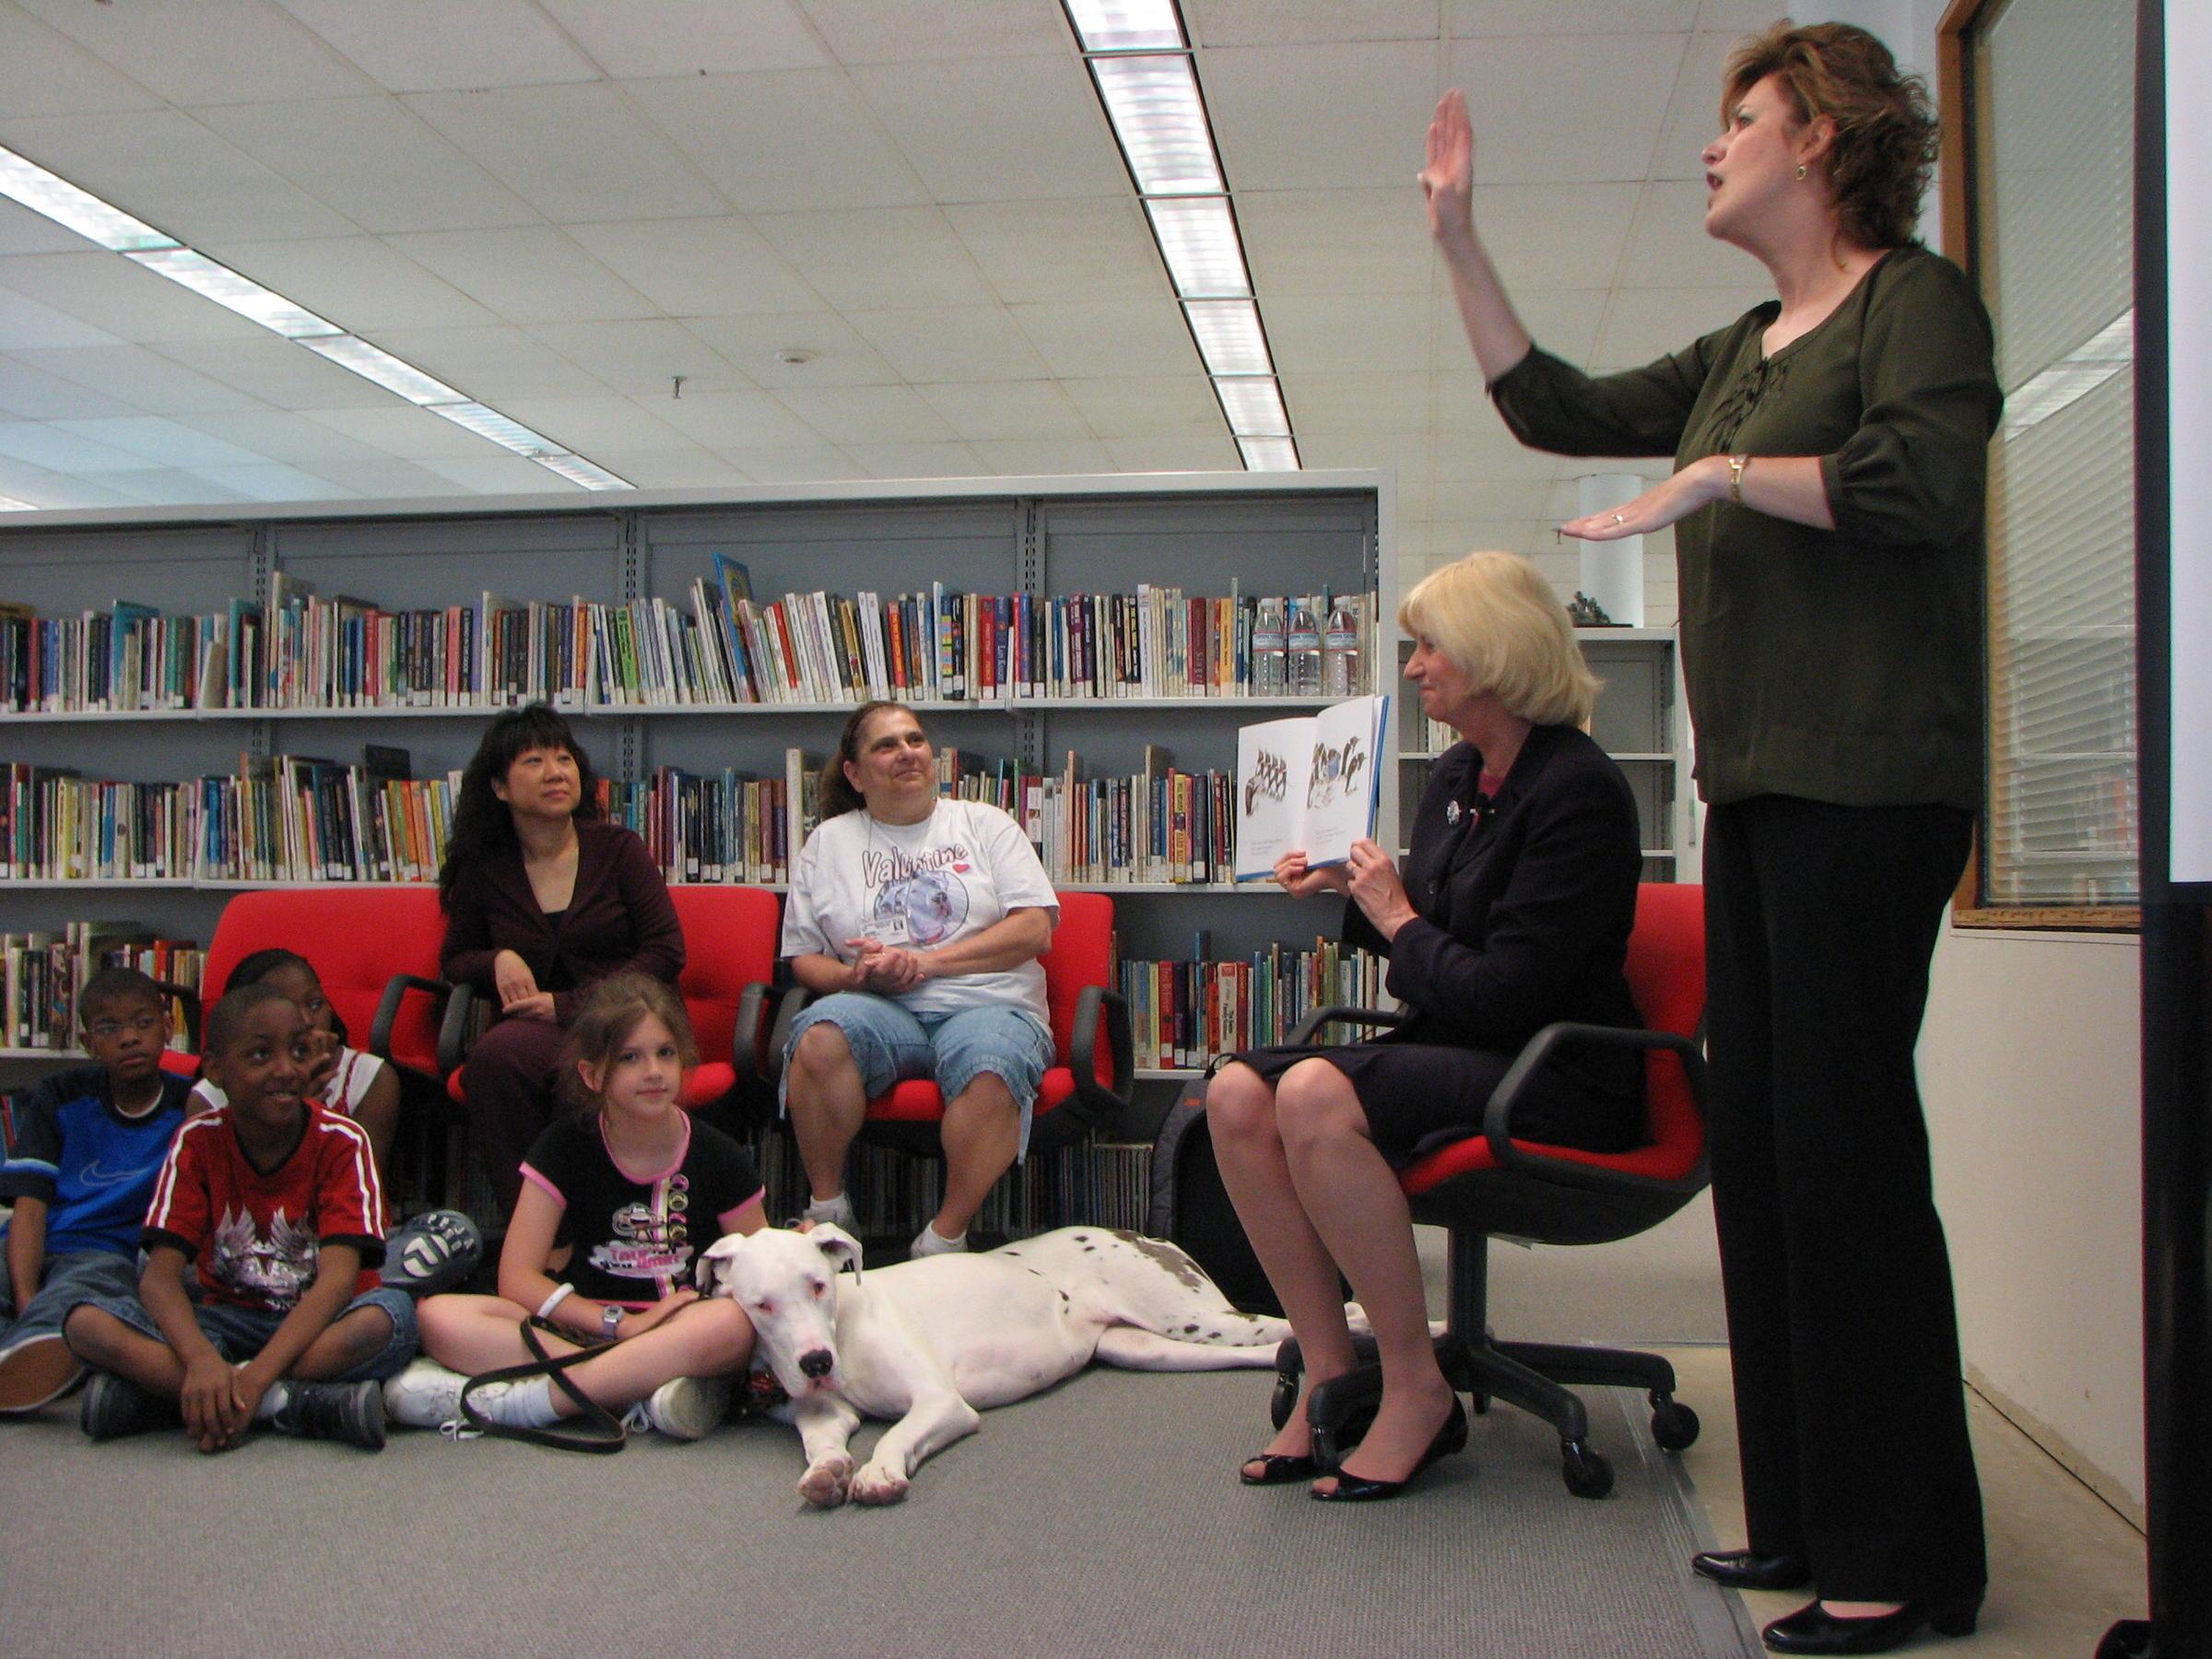 Florida House Passes ASL Interpreters Bill Unanimously | WFSU